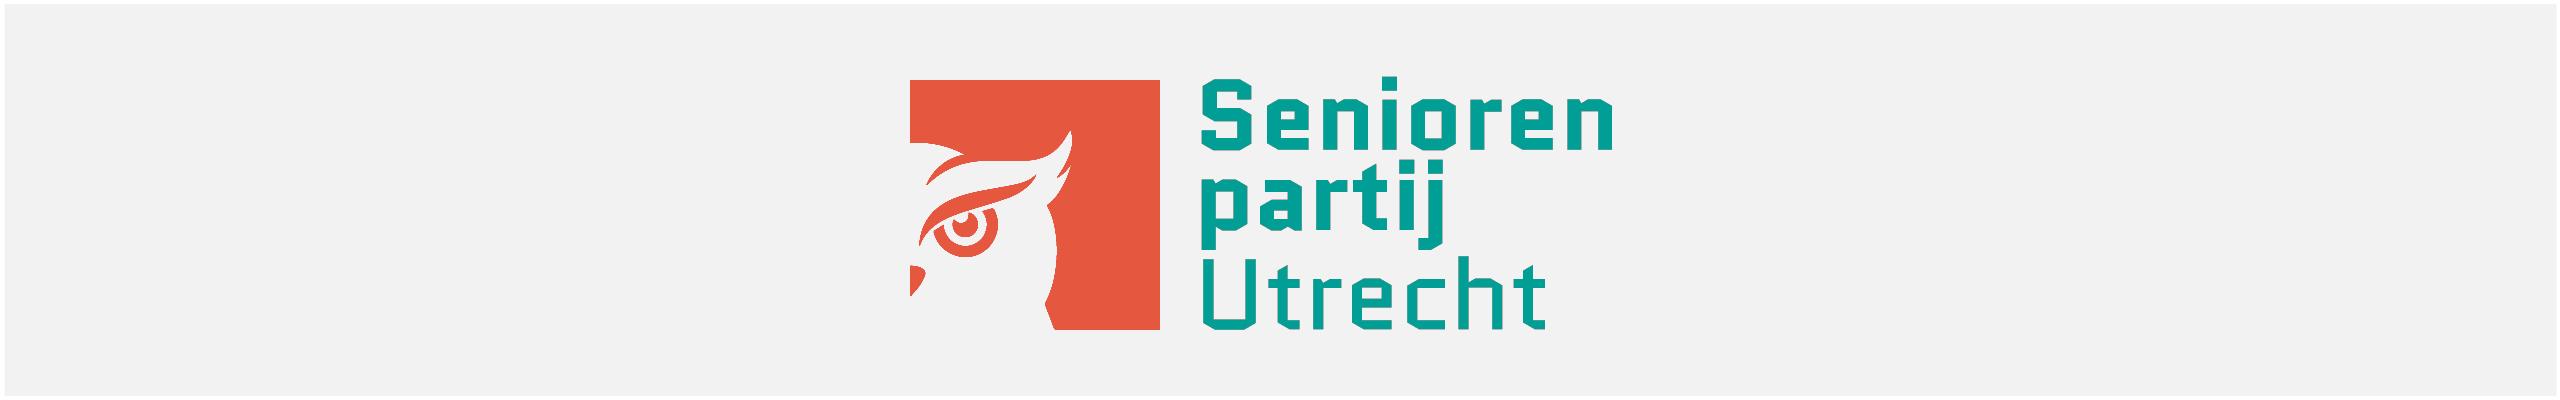 Seniorenpartij_Logo